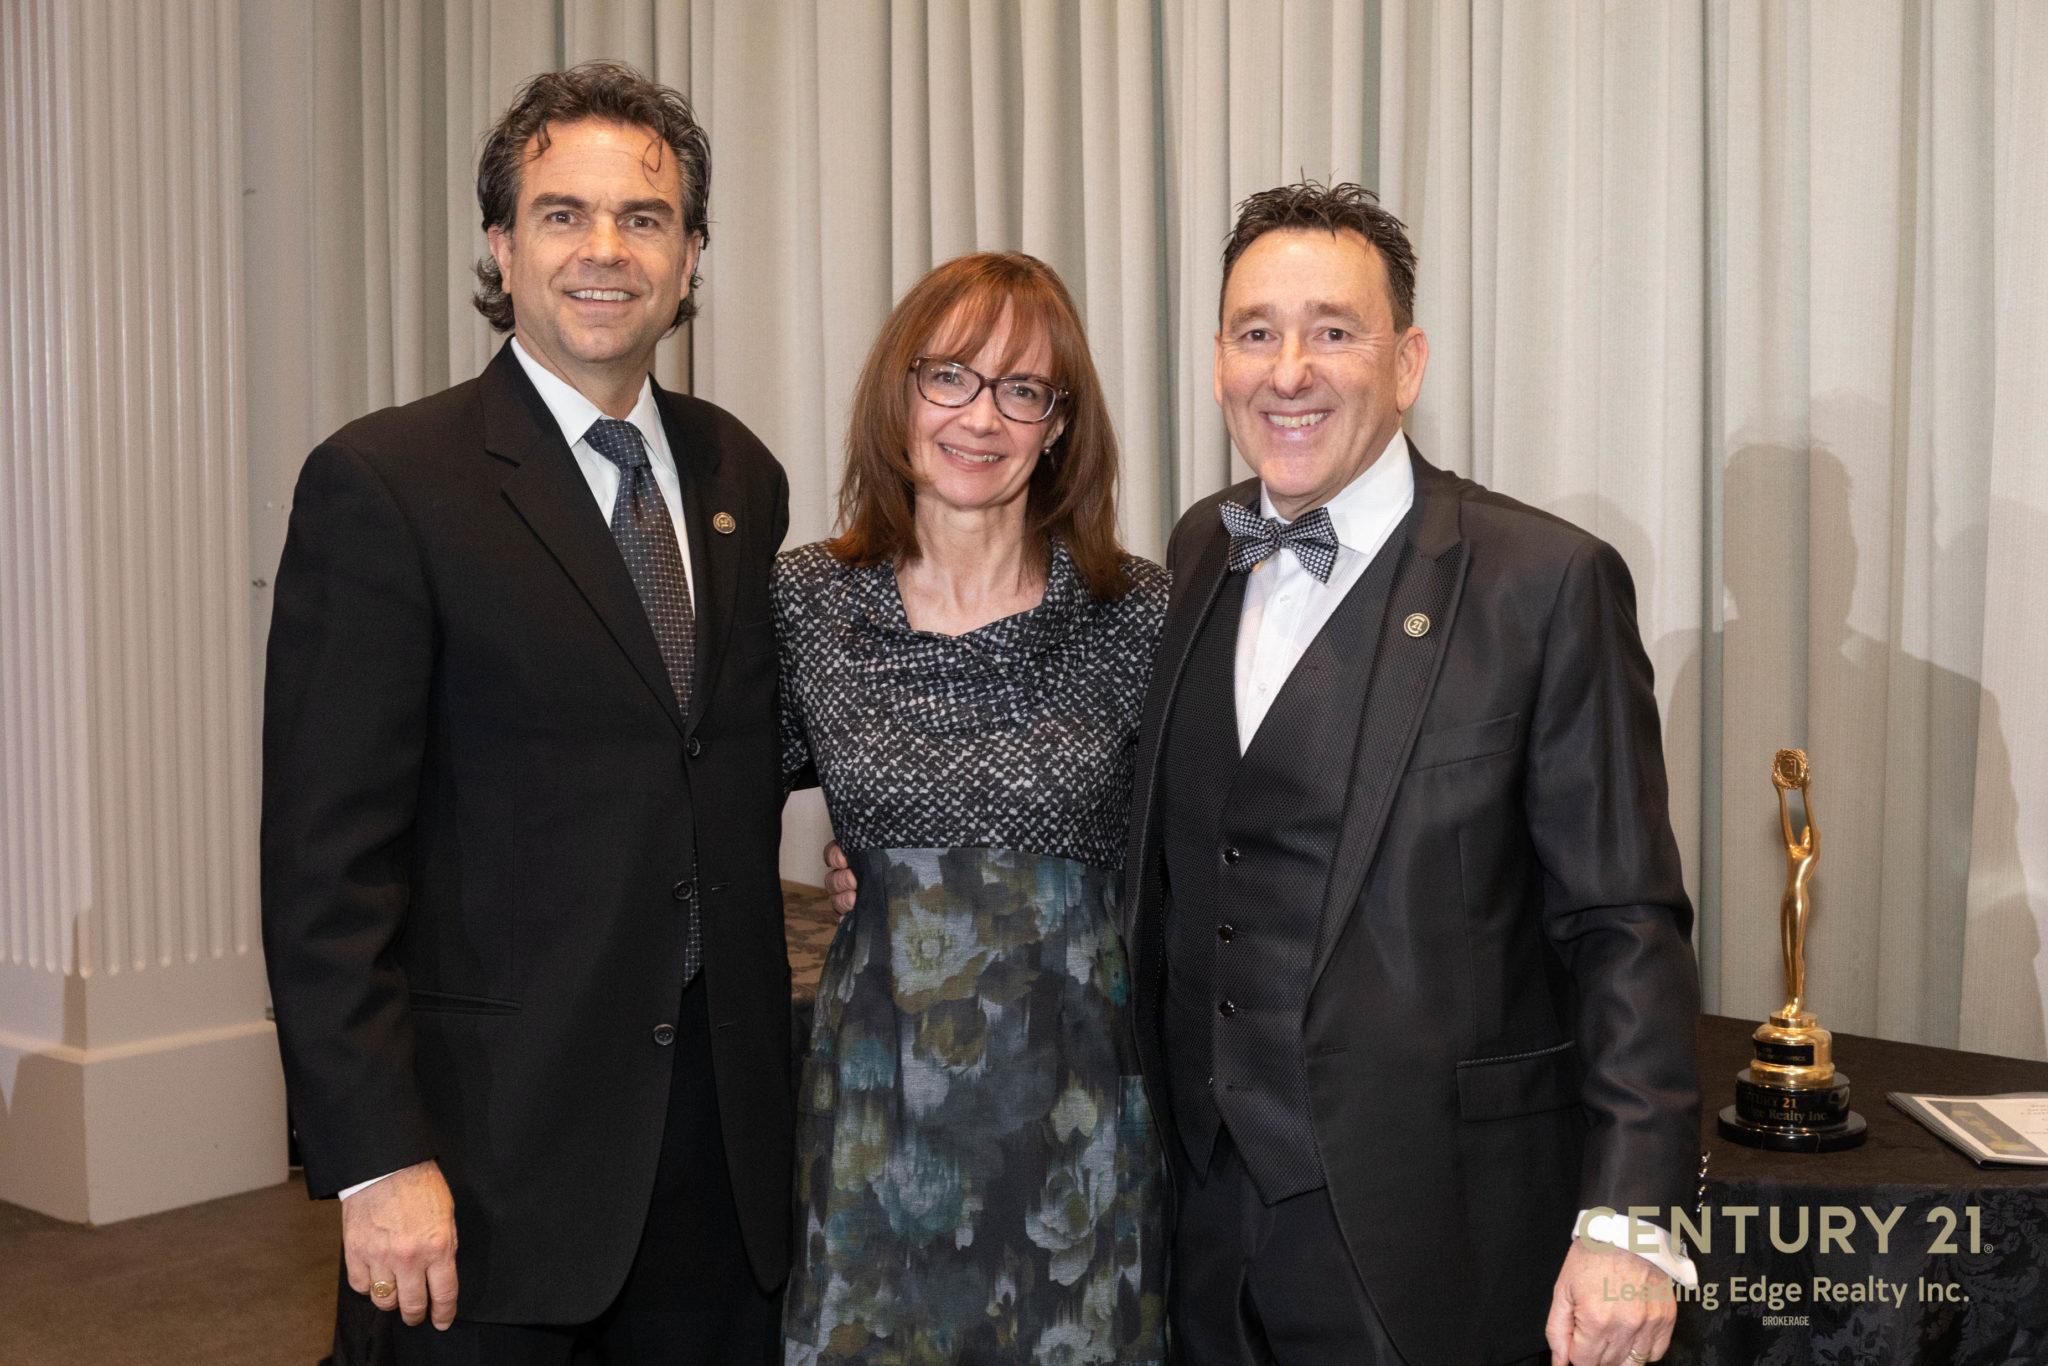 Century21 Outstanding Achievement Award - Karen Harvey Real Estate - Photo